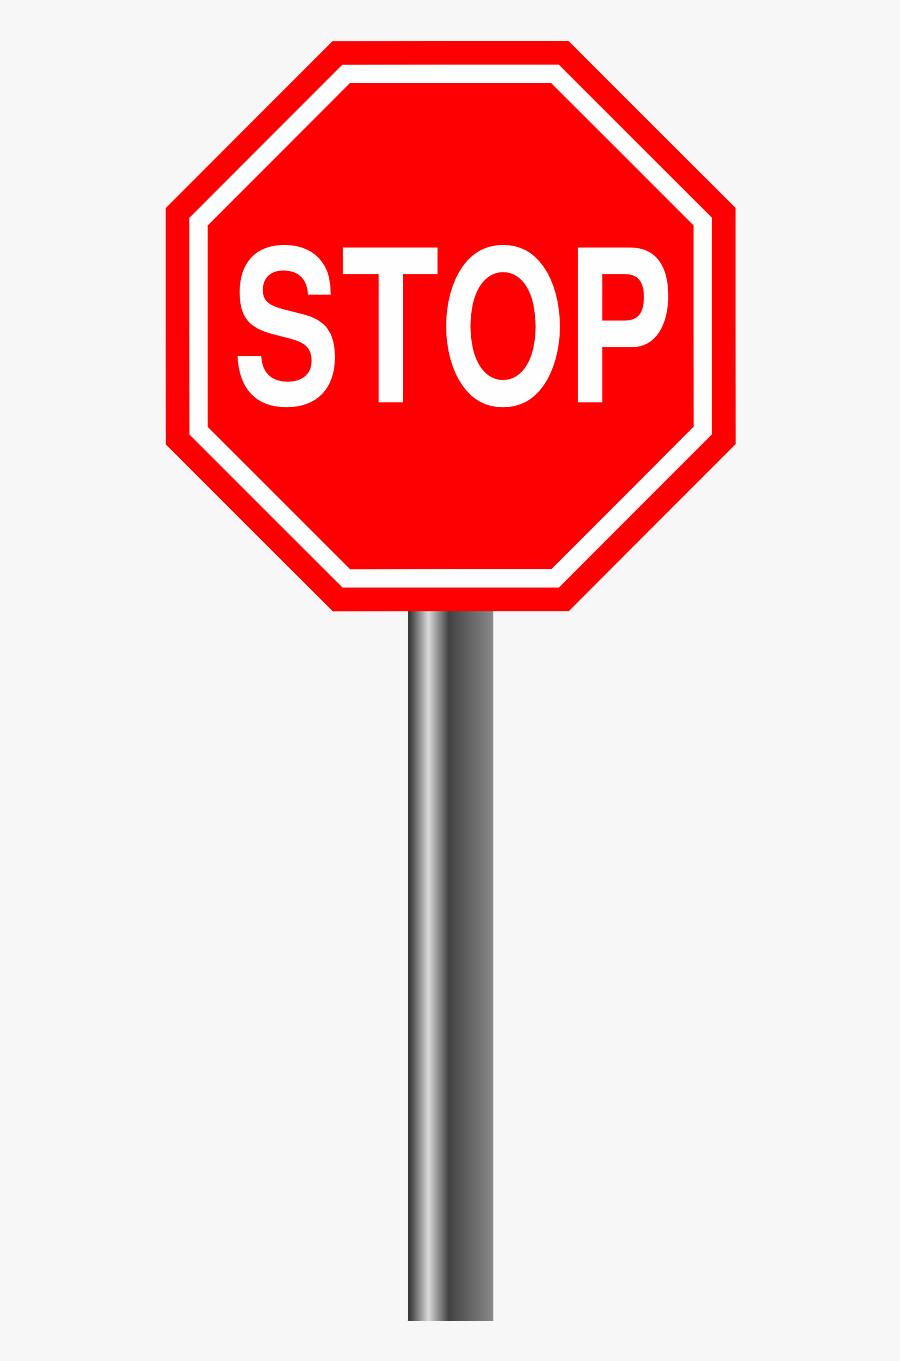 Stop Sign Clipart Png, Transparent Clipart